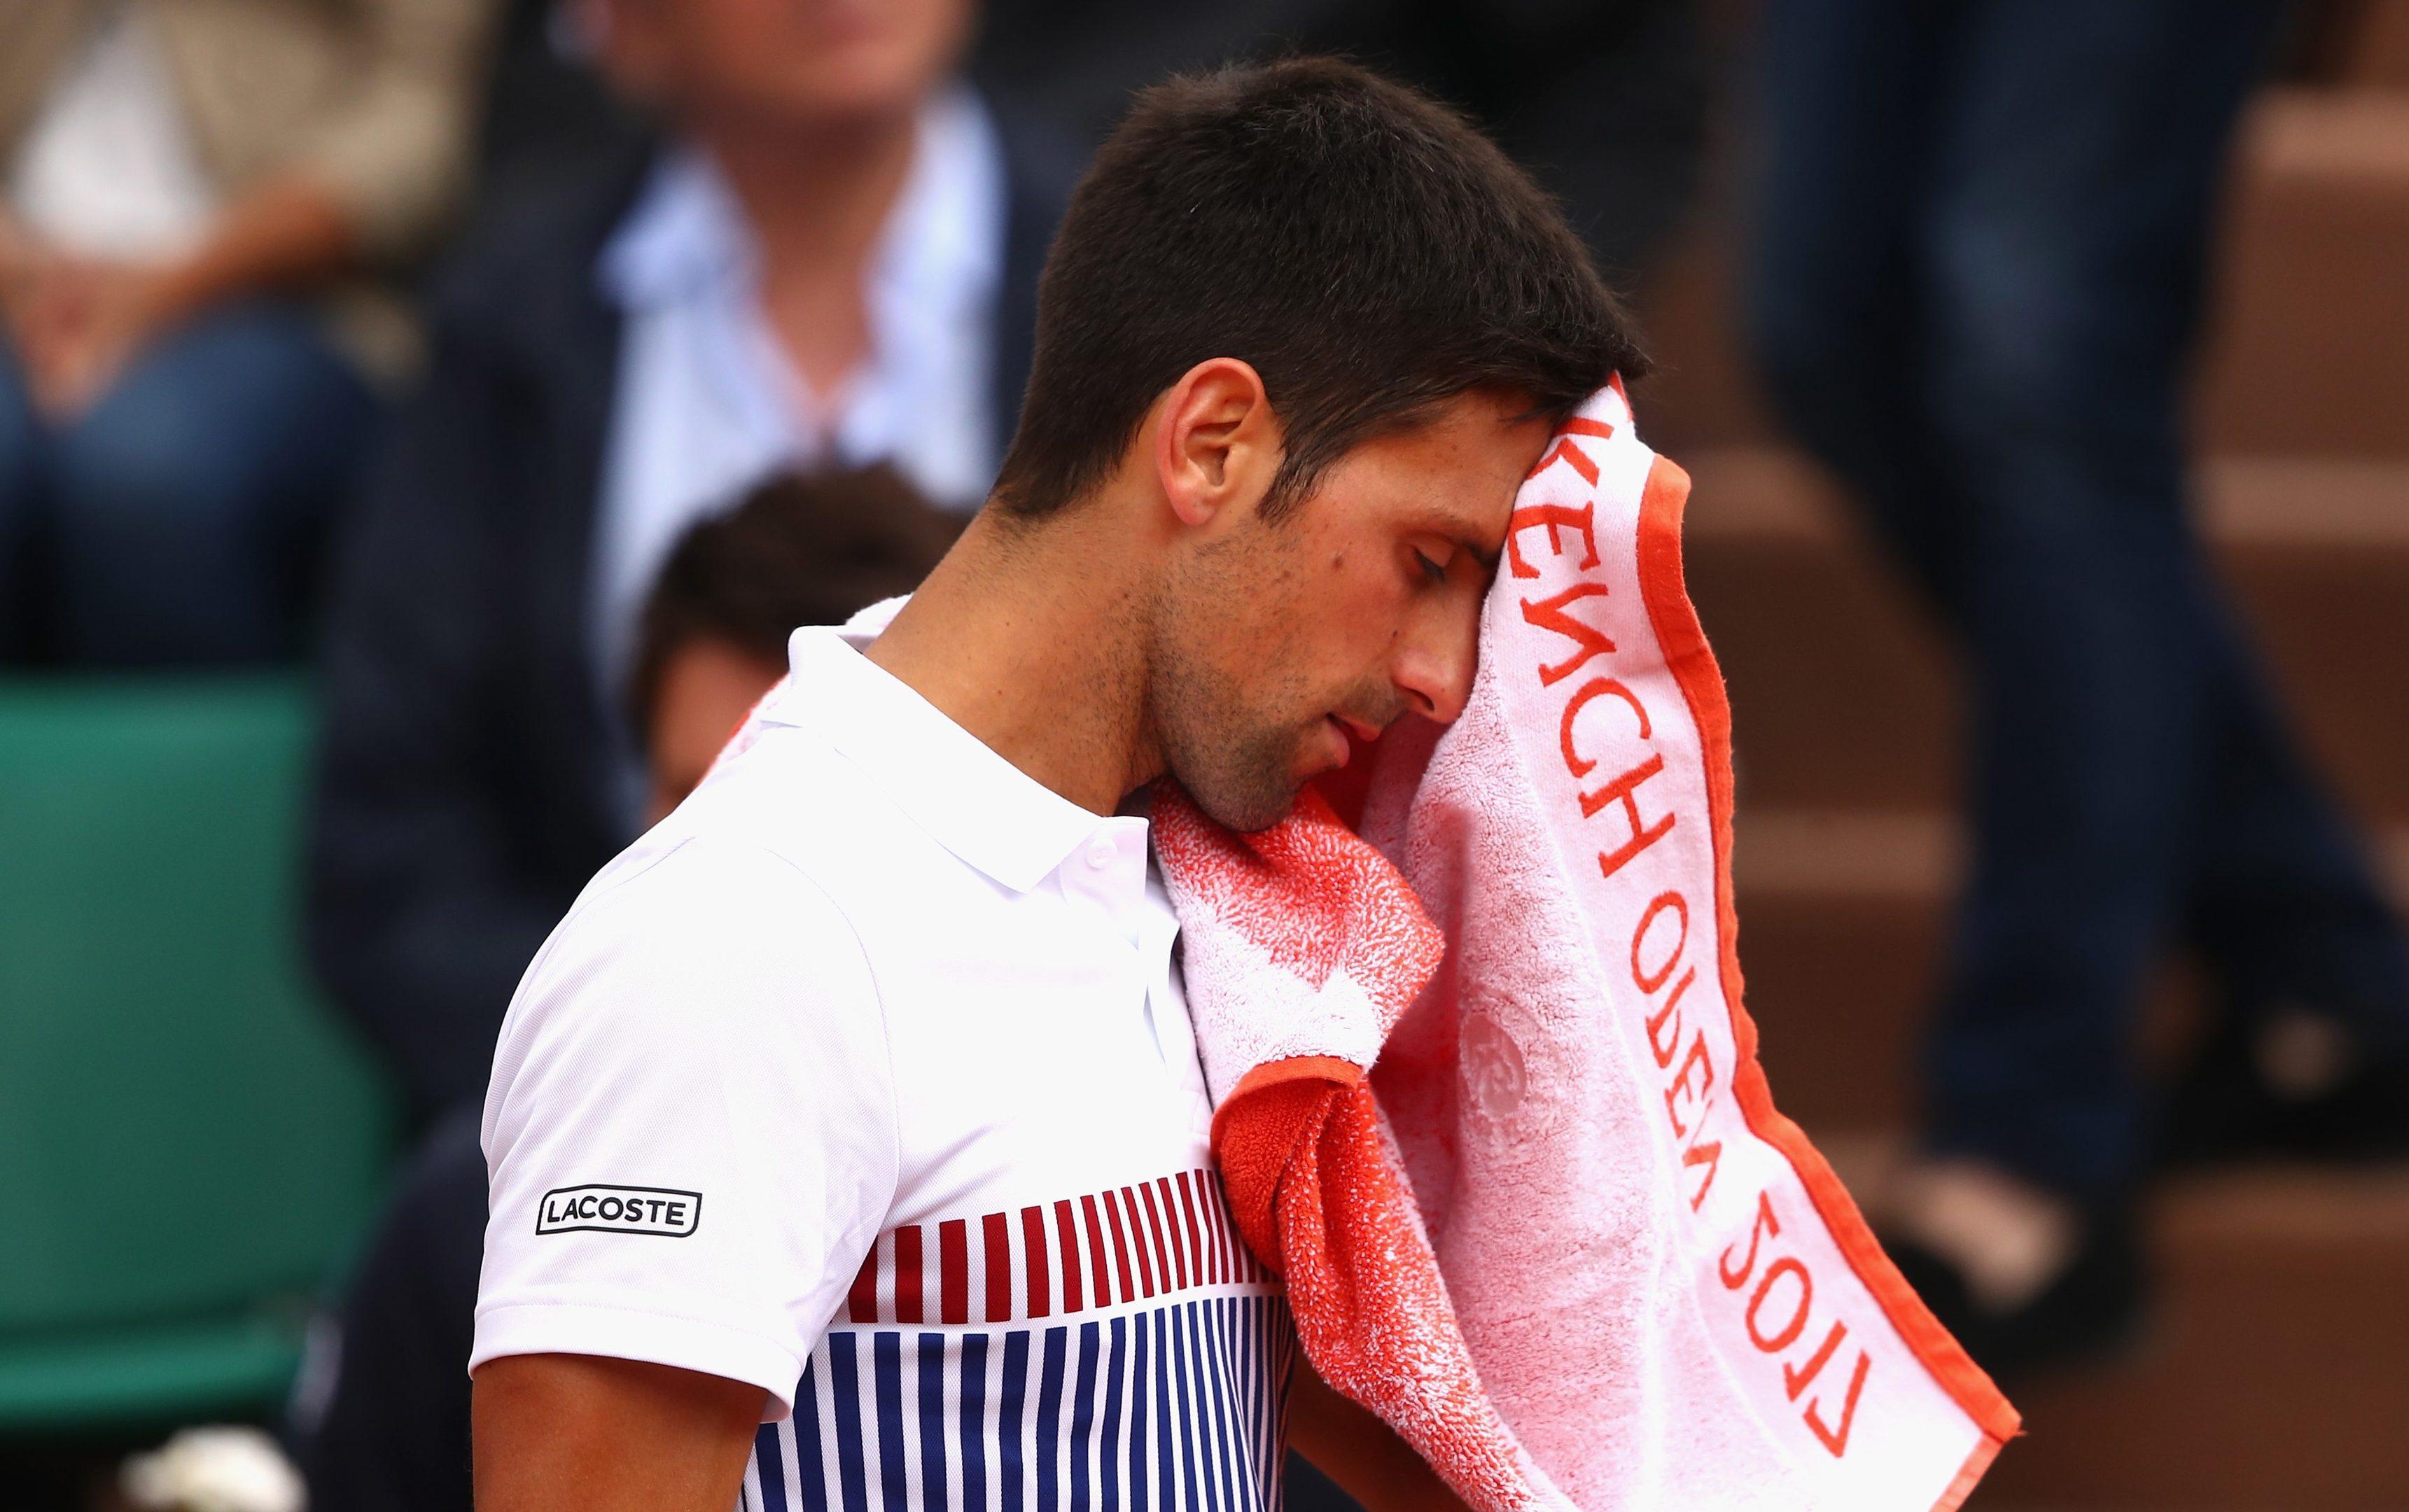 It's been hard work for Novak Djokovic of late.